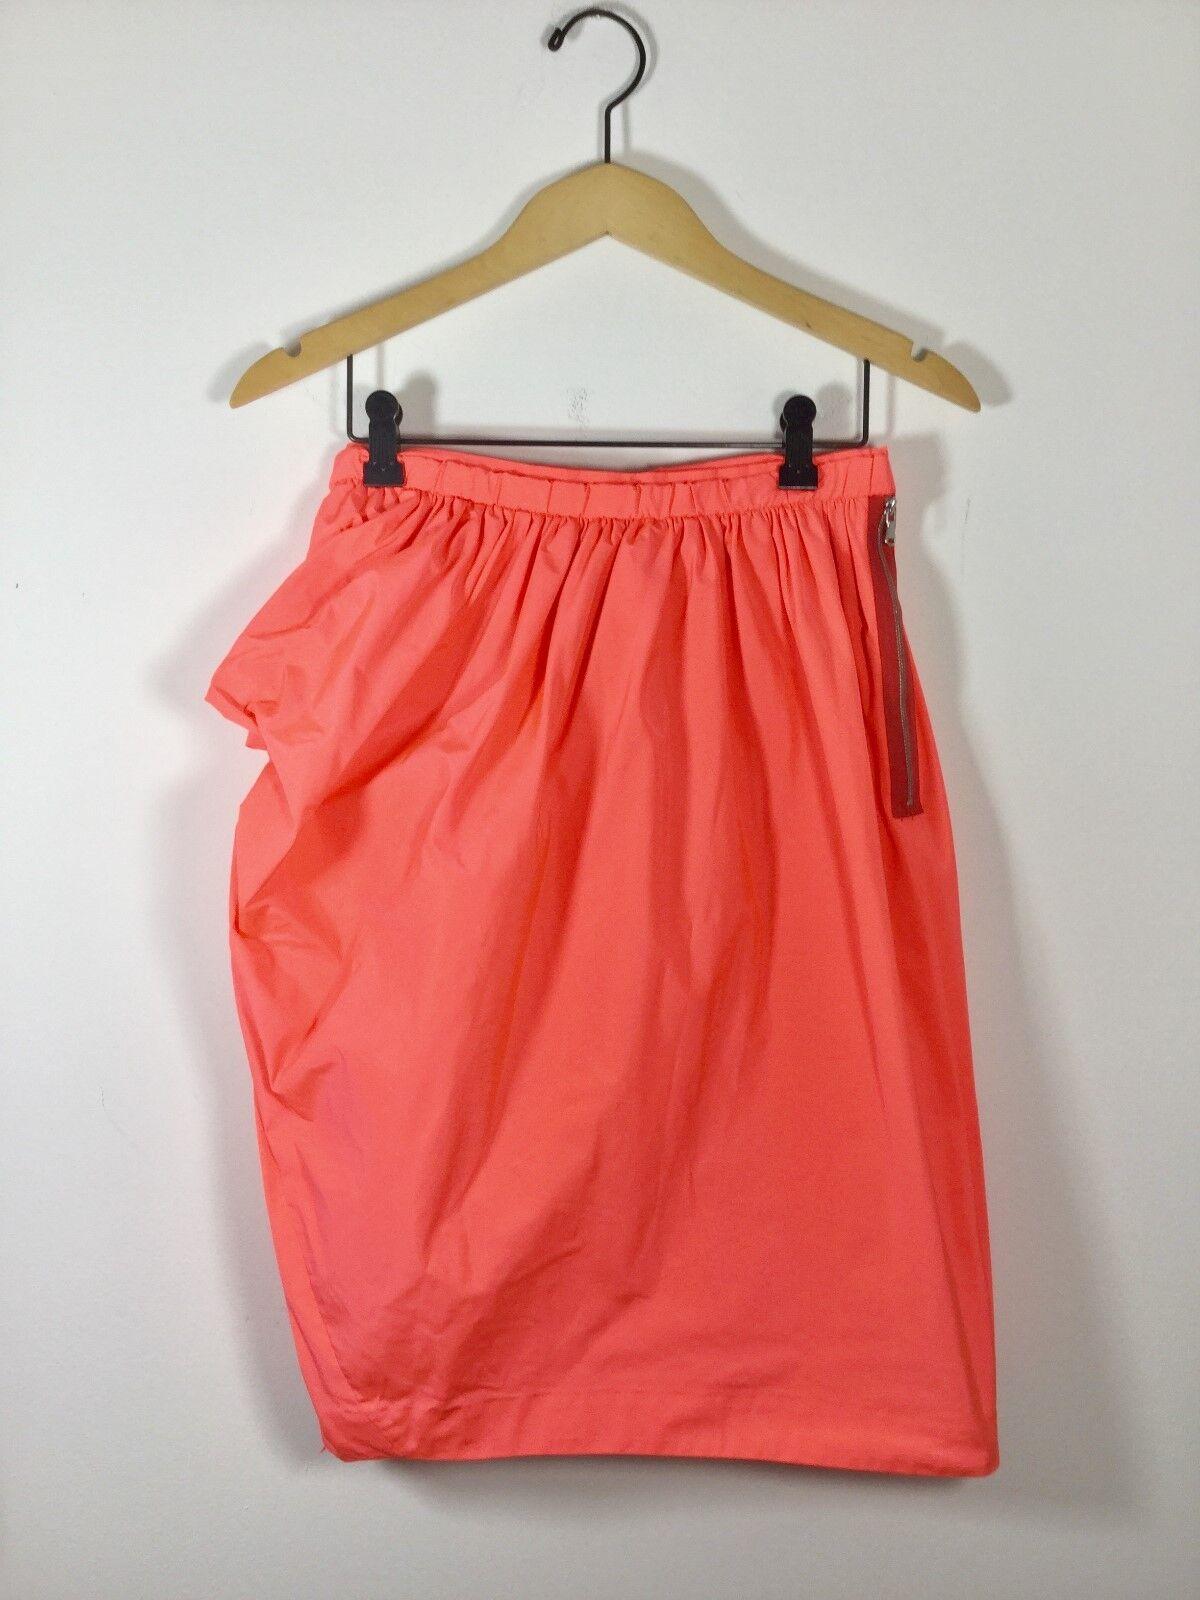 MARC BY MARC JACOBS Lava orange Bubble Size 6 Knee Length Skirt